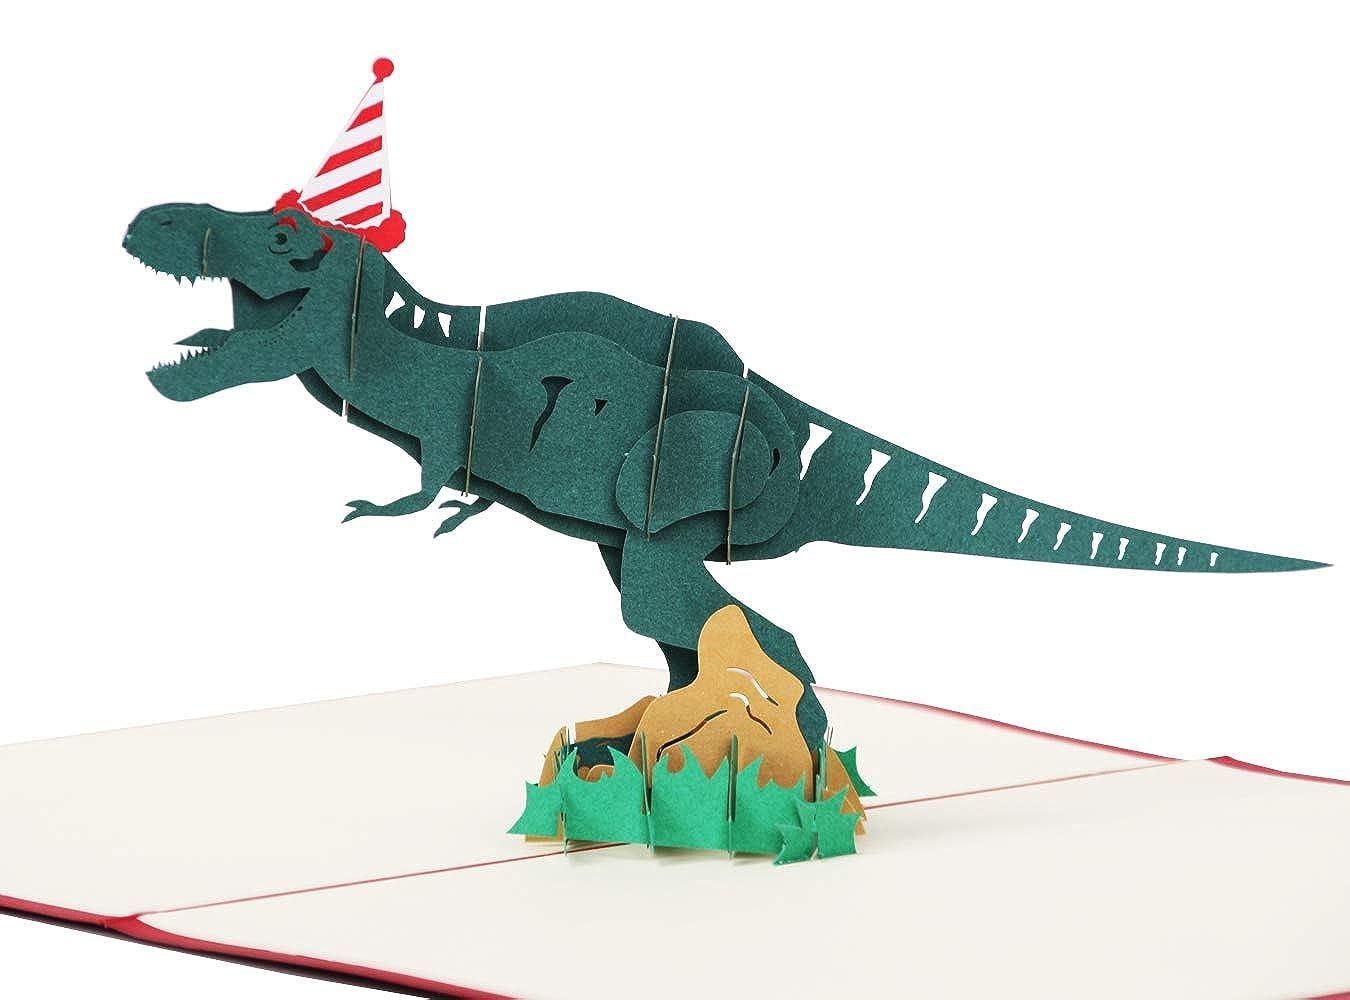 LANGXUN 3D Pop Up Dinosaur Happy Birthday Card Jurassic Tyrannosaurus Personalized Kid Funny Greeting Cards Amazoncouk Clothing